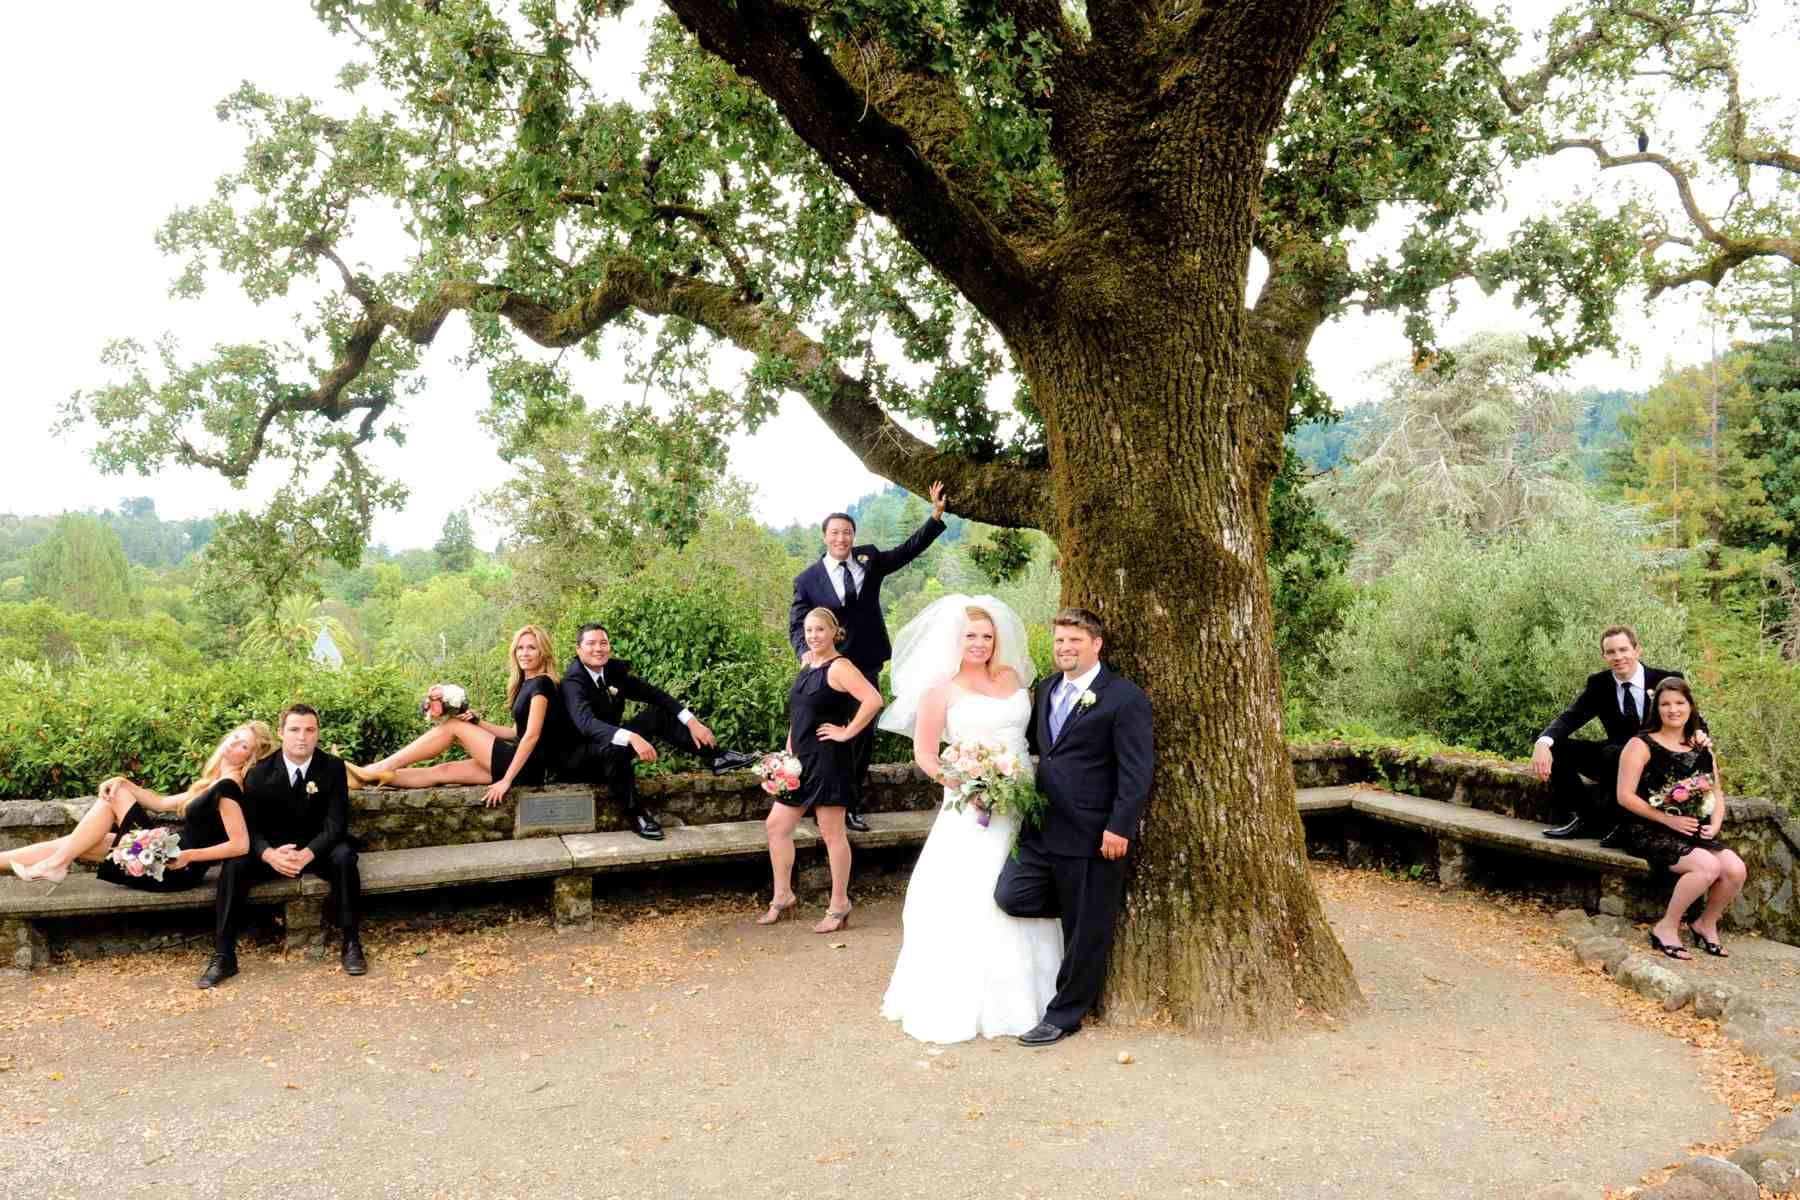 San Francisco Bay Area Destination Wedding Photographer San Francisco Theologial Seminary Wedding Image / Photo